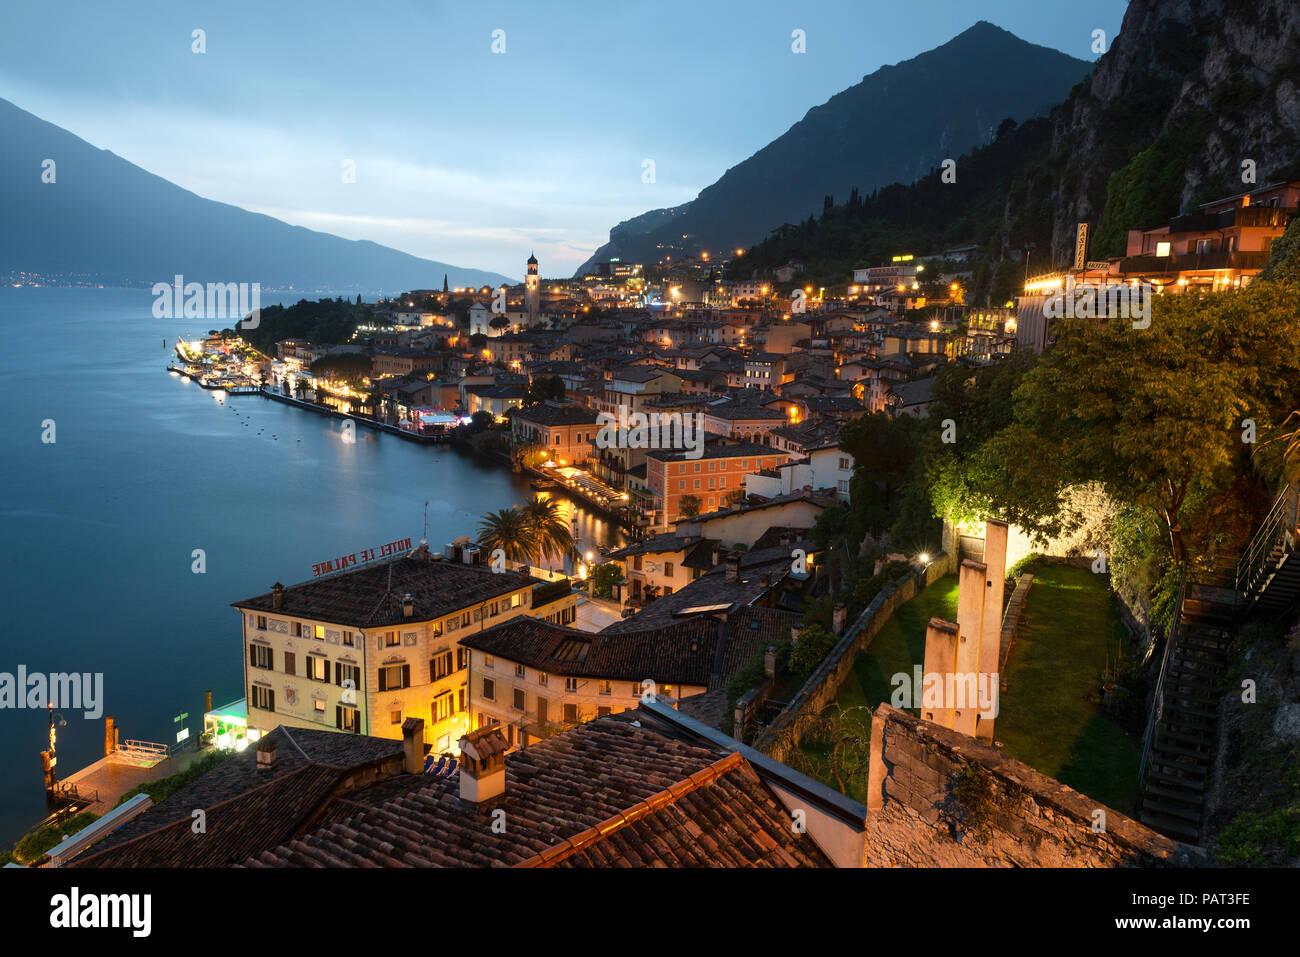 Lake Garda. View over the town and harbour in Limone sul Garda, Lake Garda, Italian Lakes, Lombardy, Italy Stock Photo